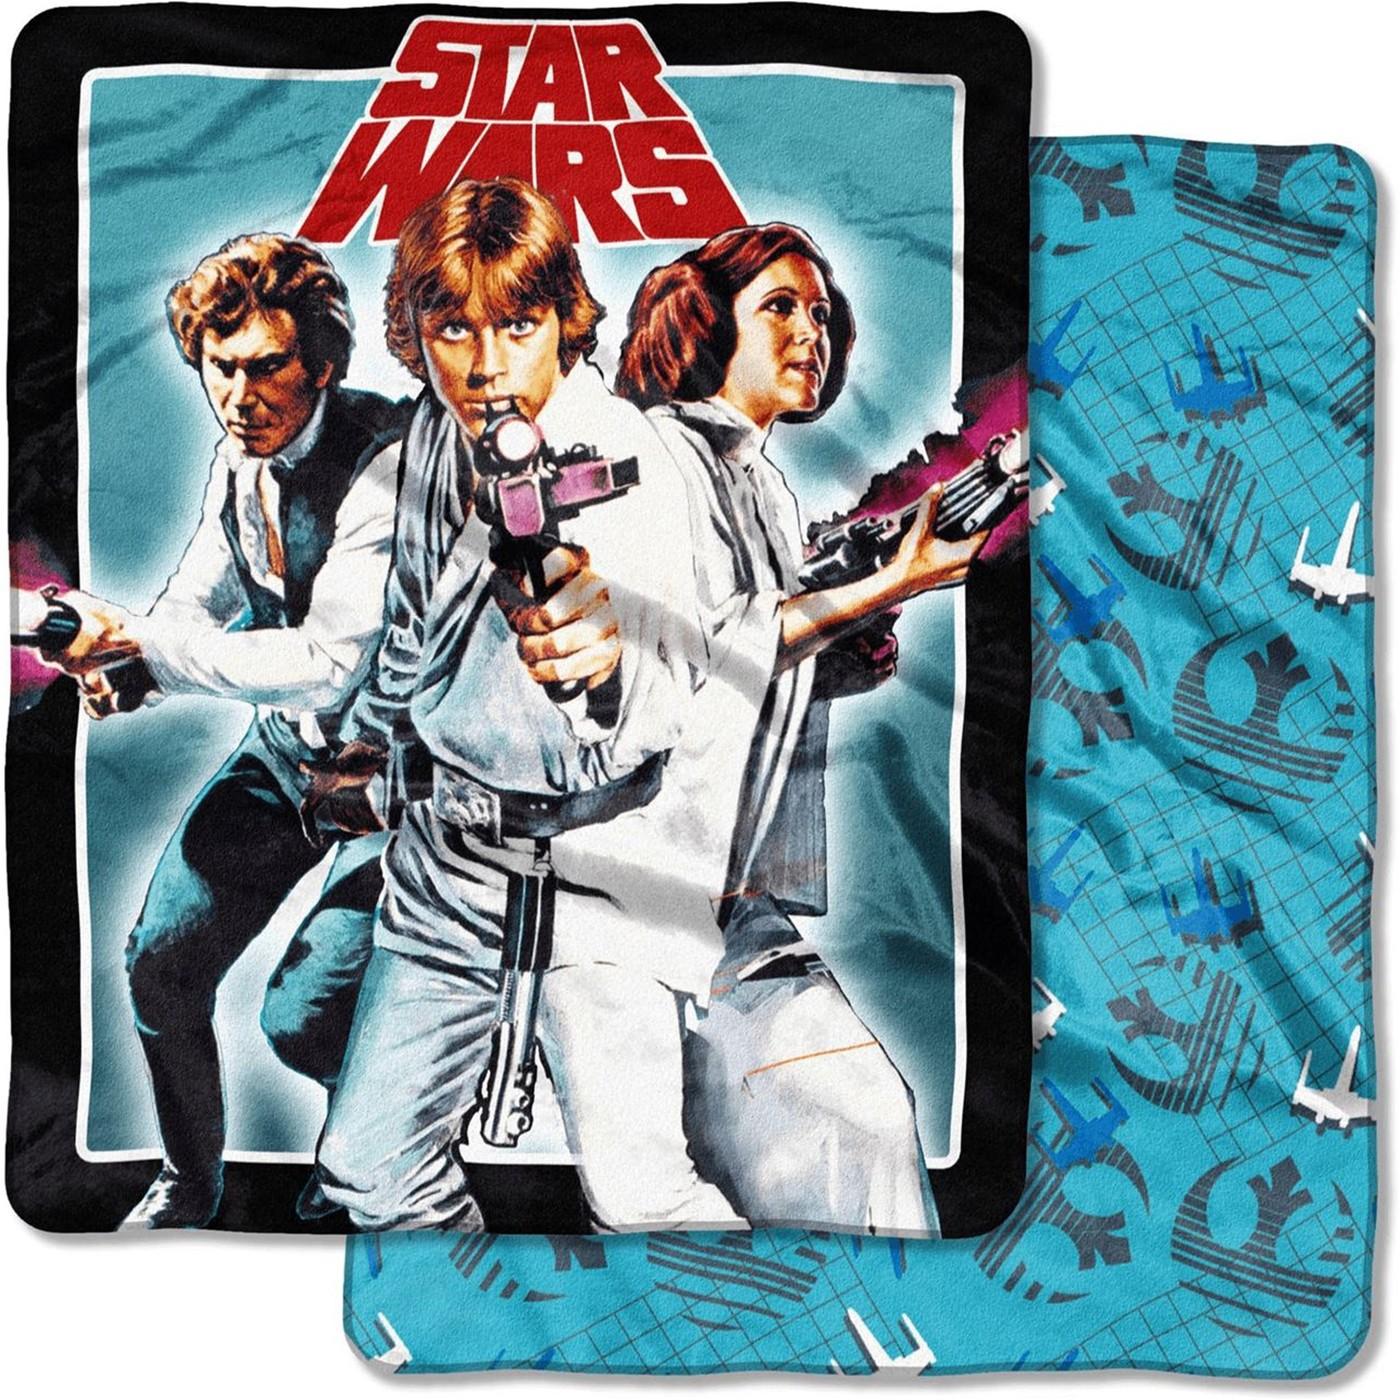 Star Wars Classic Hopeful Trio Blanket